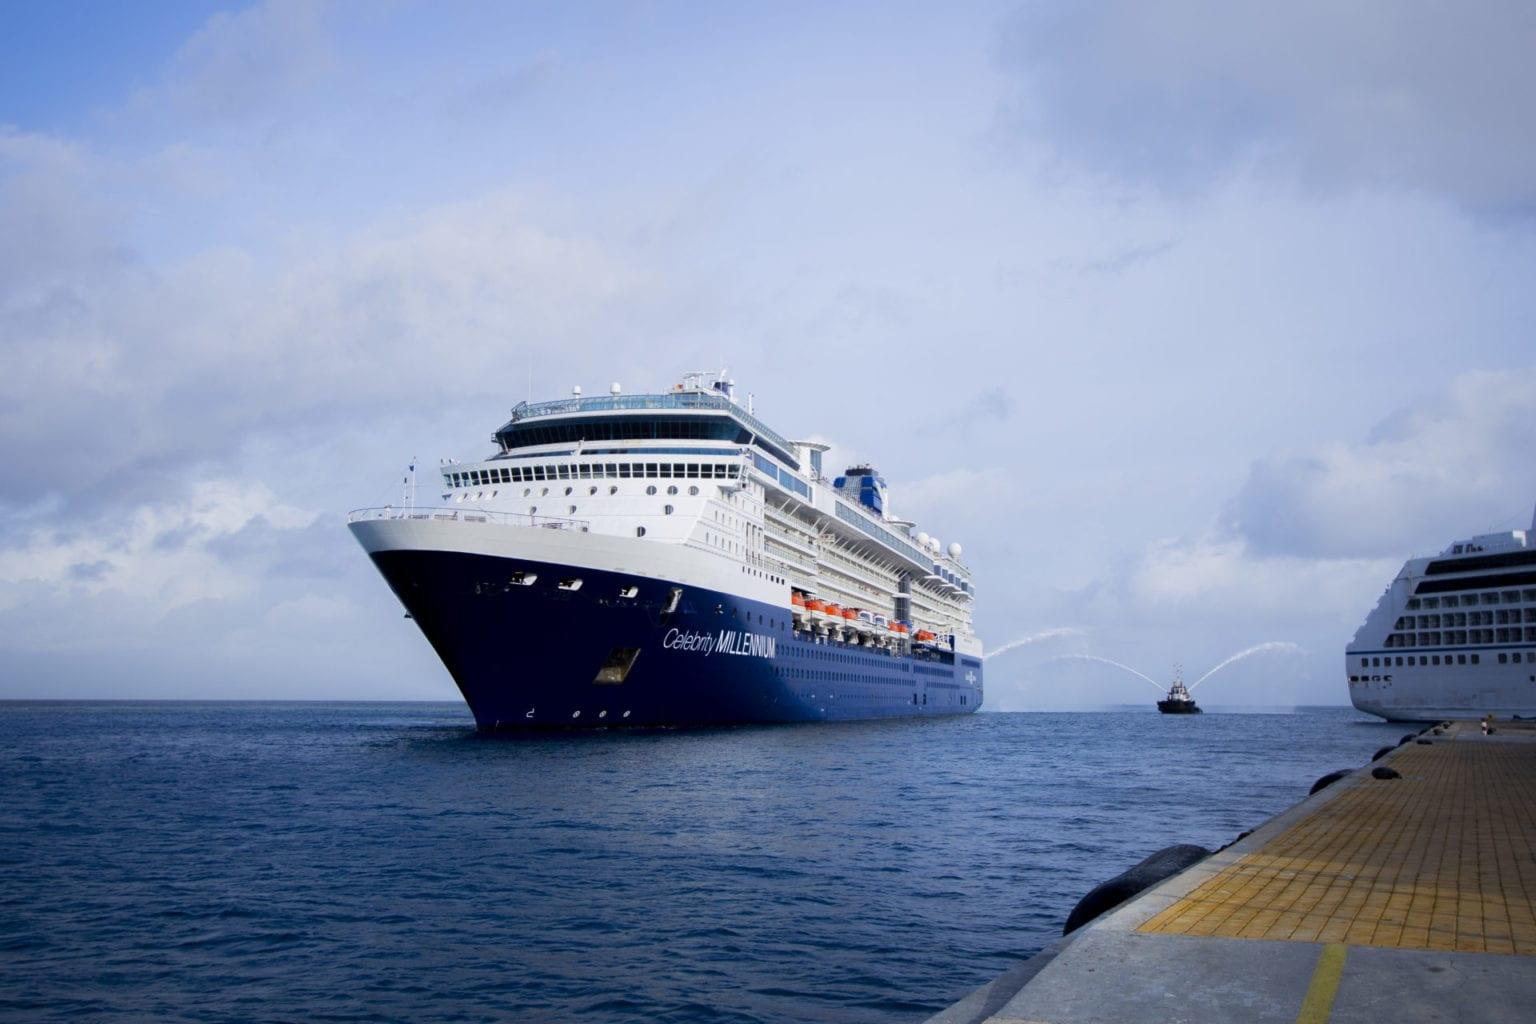 Aruba a habri pa crucero atrobe